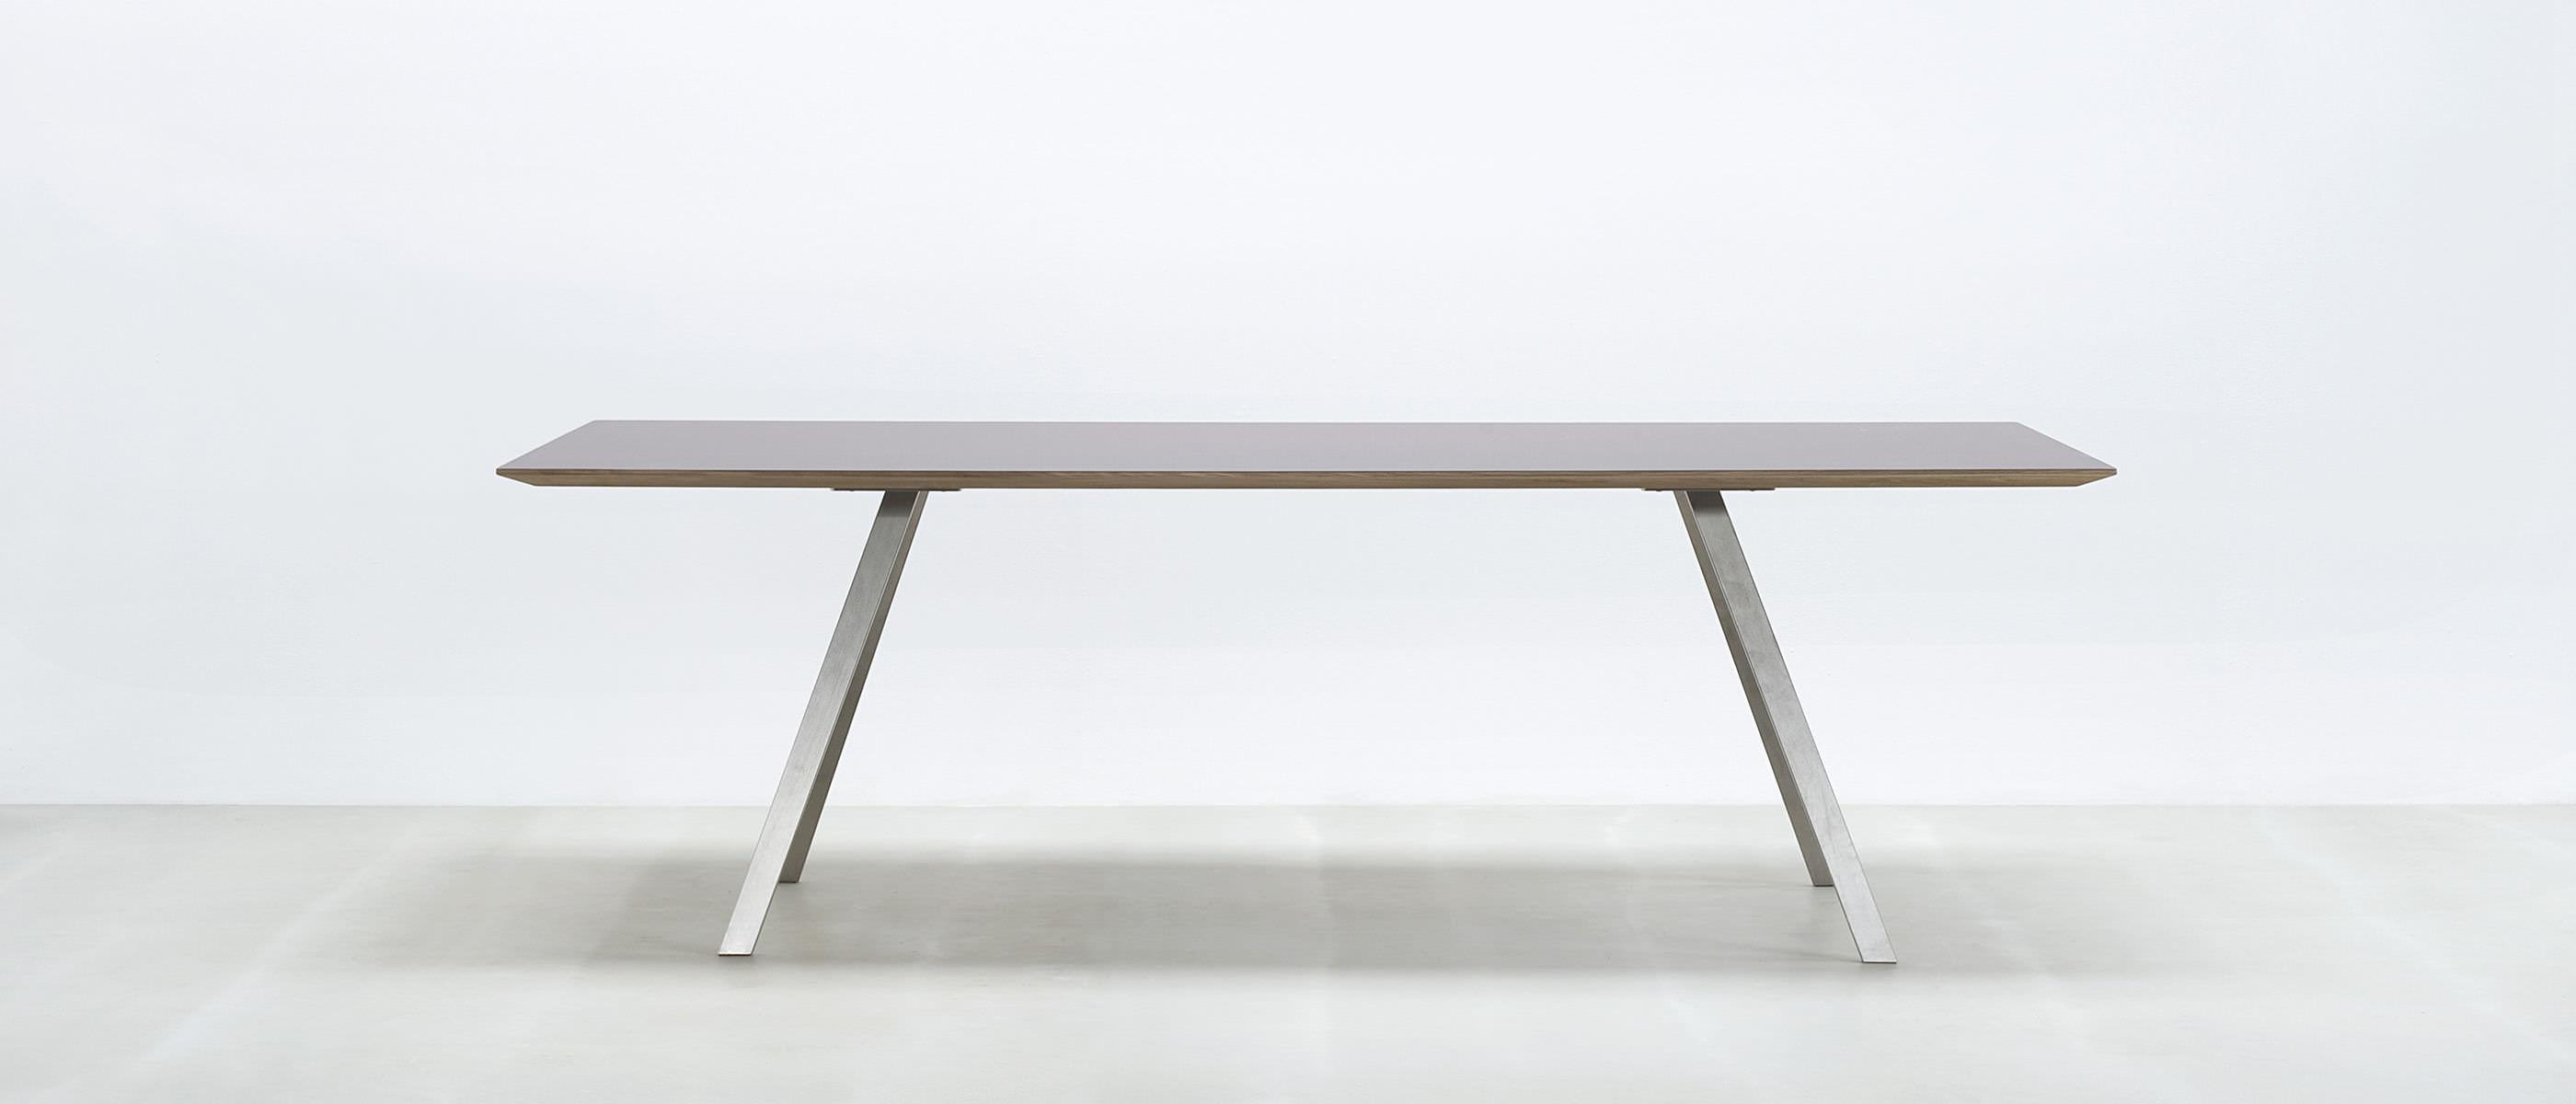 Composite # Table De Jardin Livraison Rapide